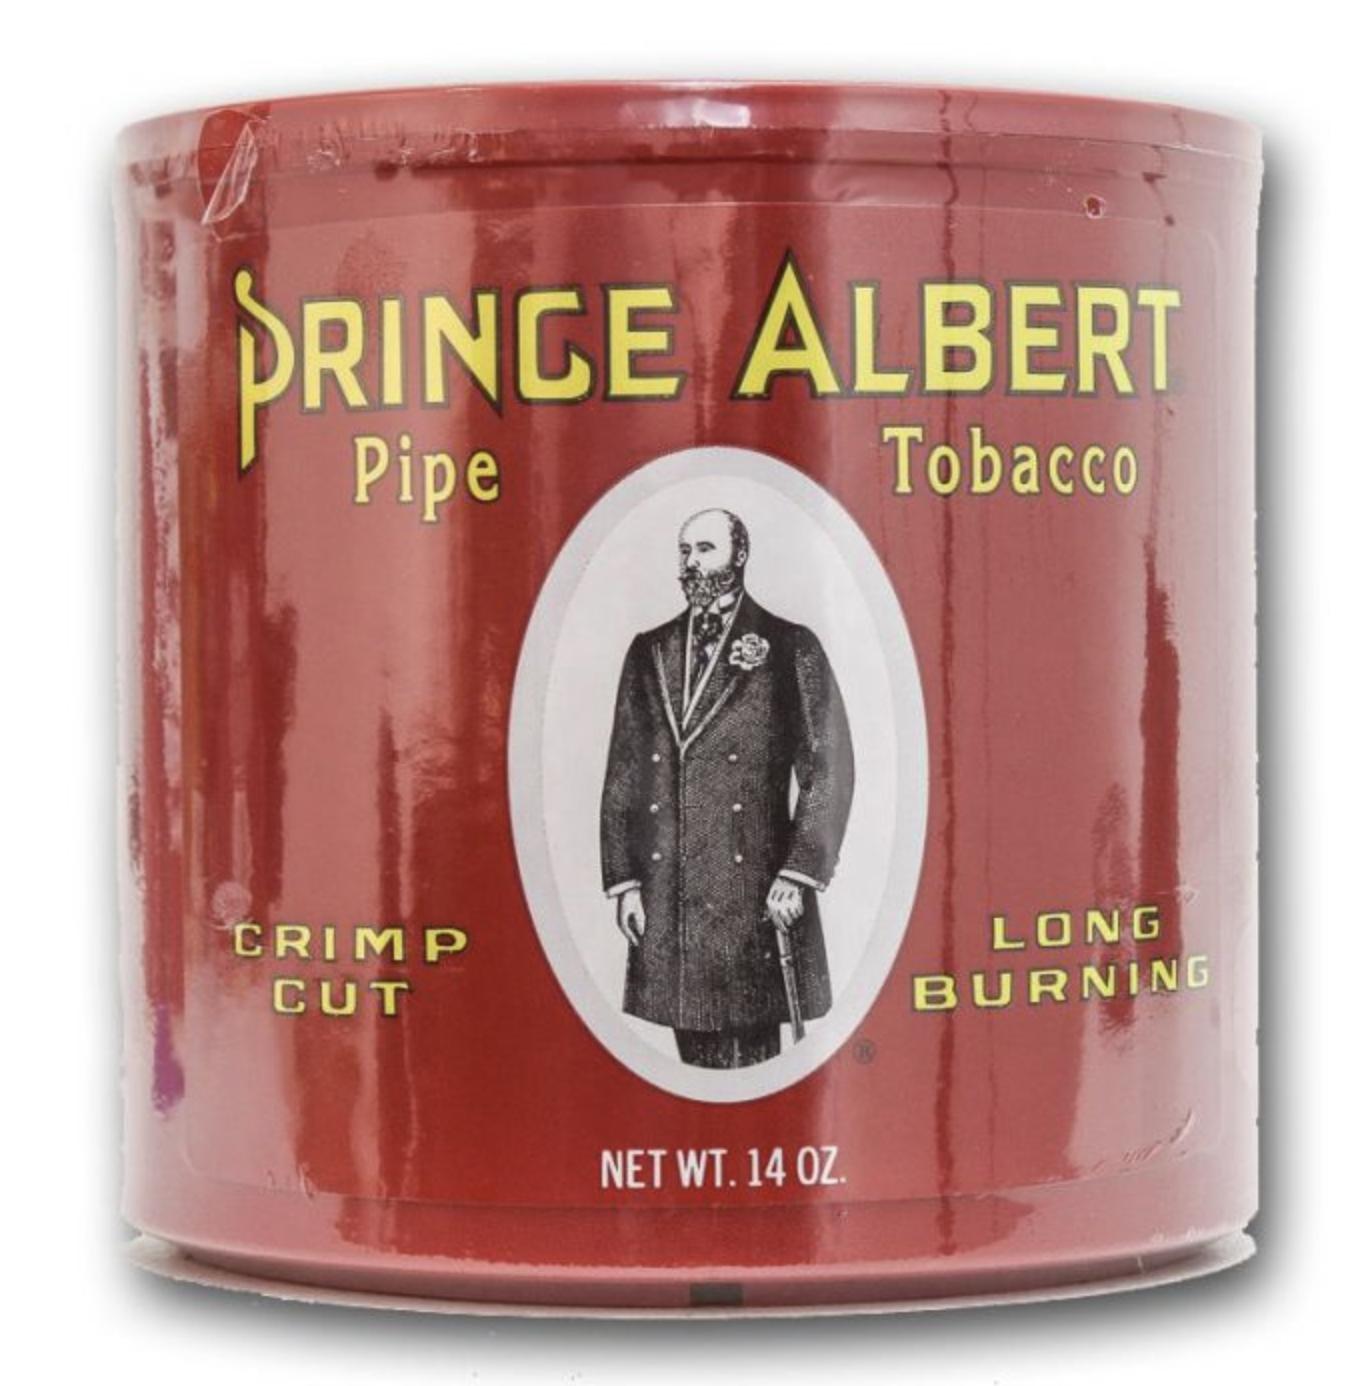 Prince Albert Screen-Shot-2020-10-03-at-2.01.52-PM